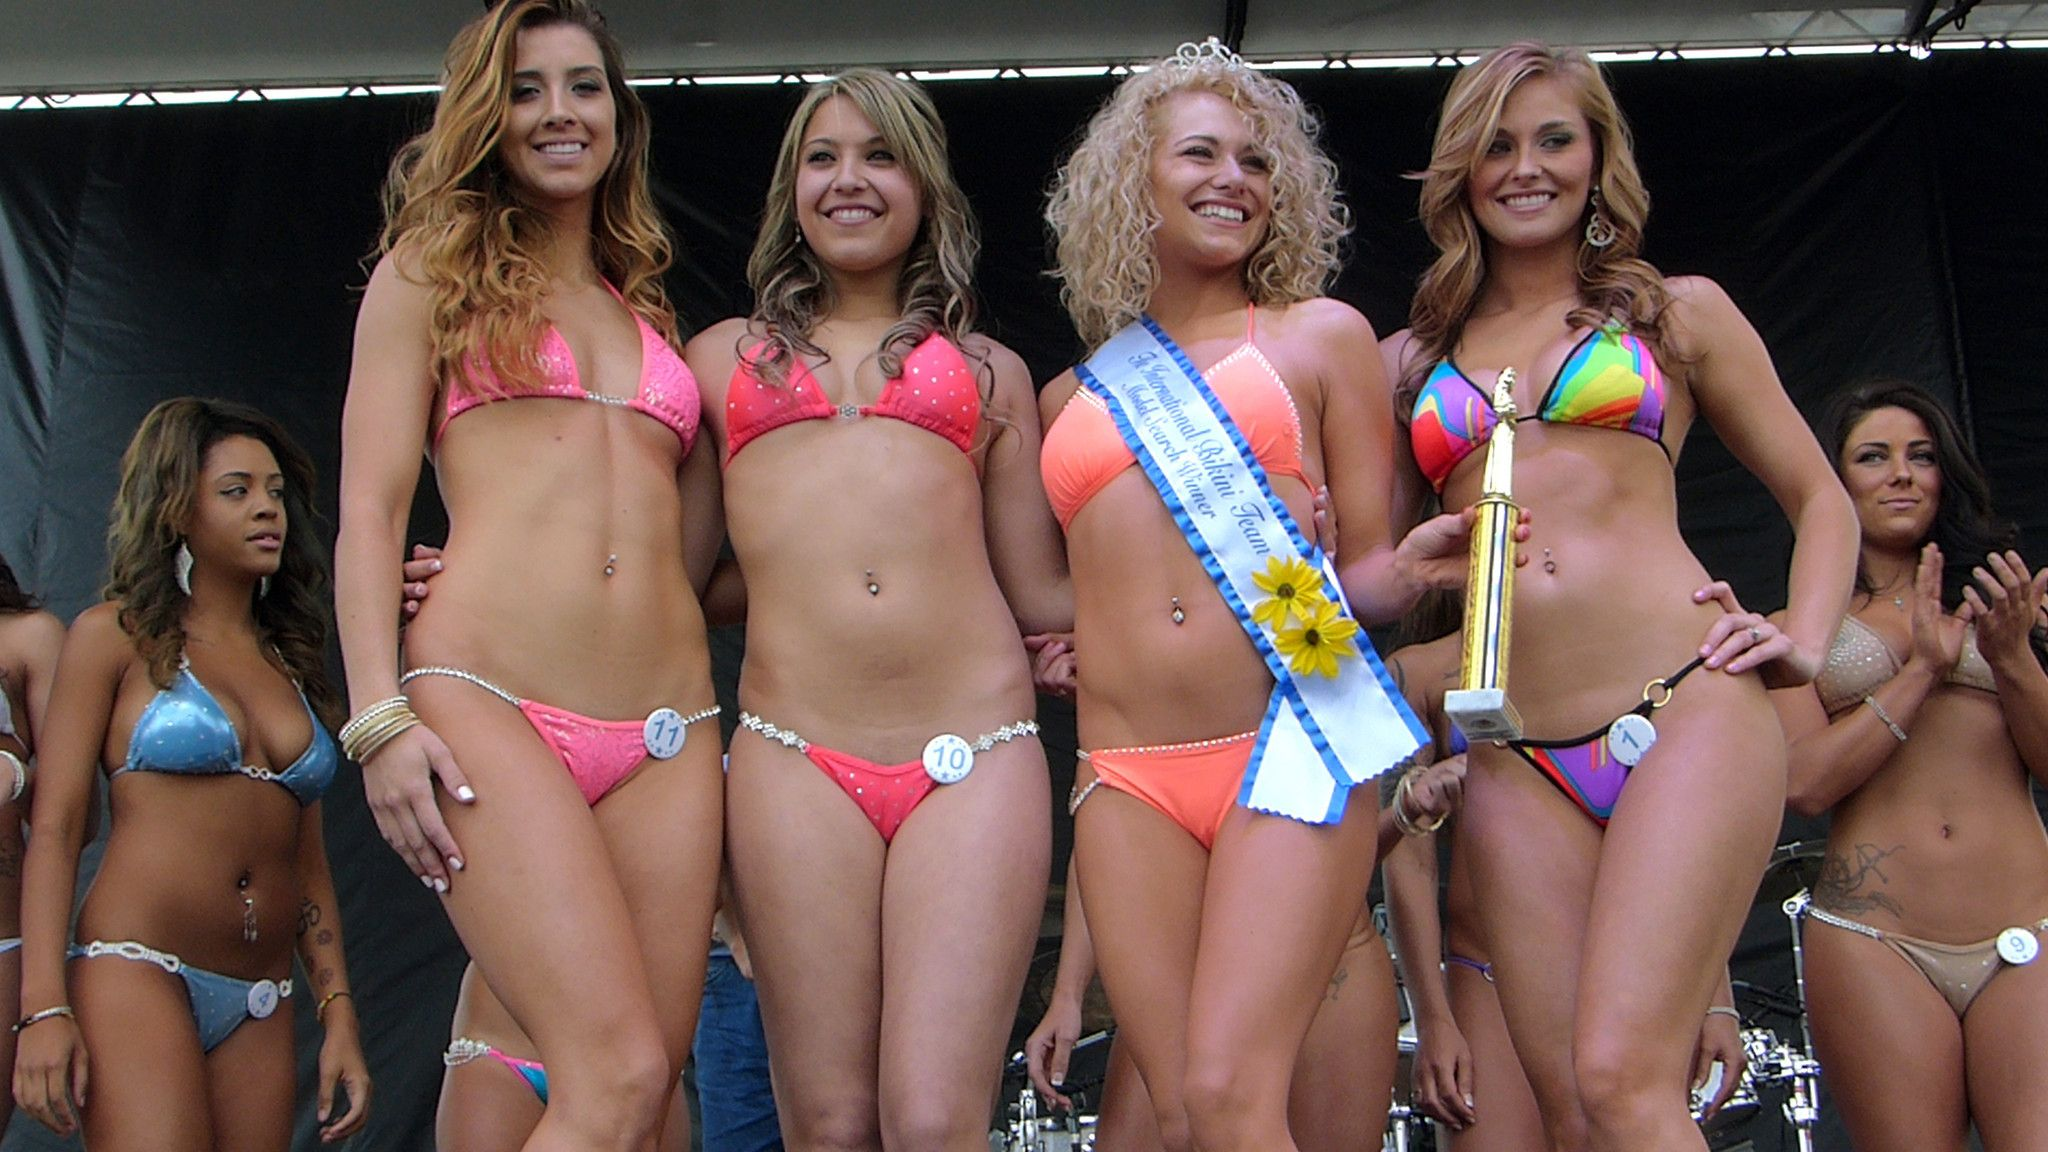 Lindsay lohan bikini movie